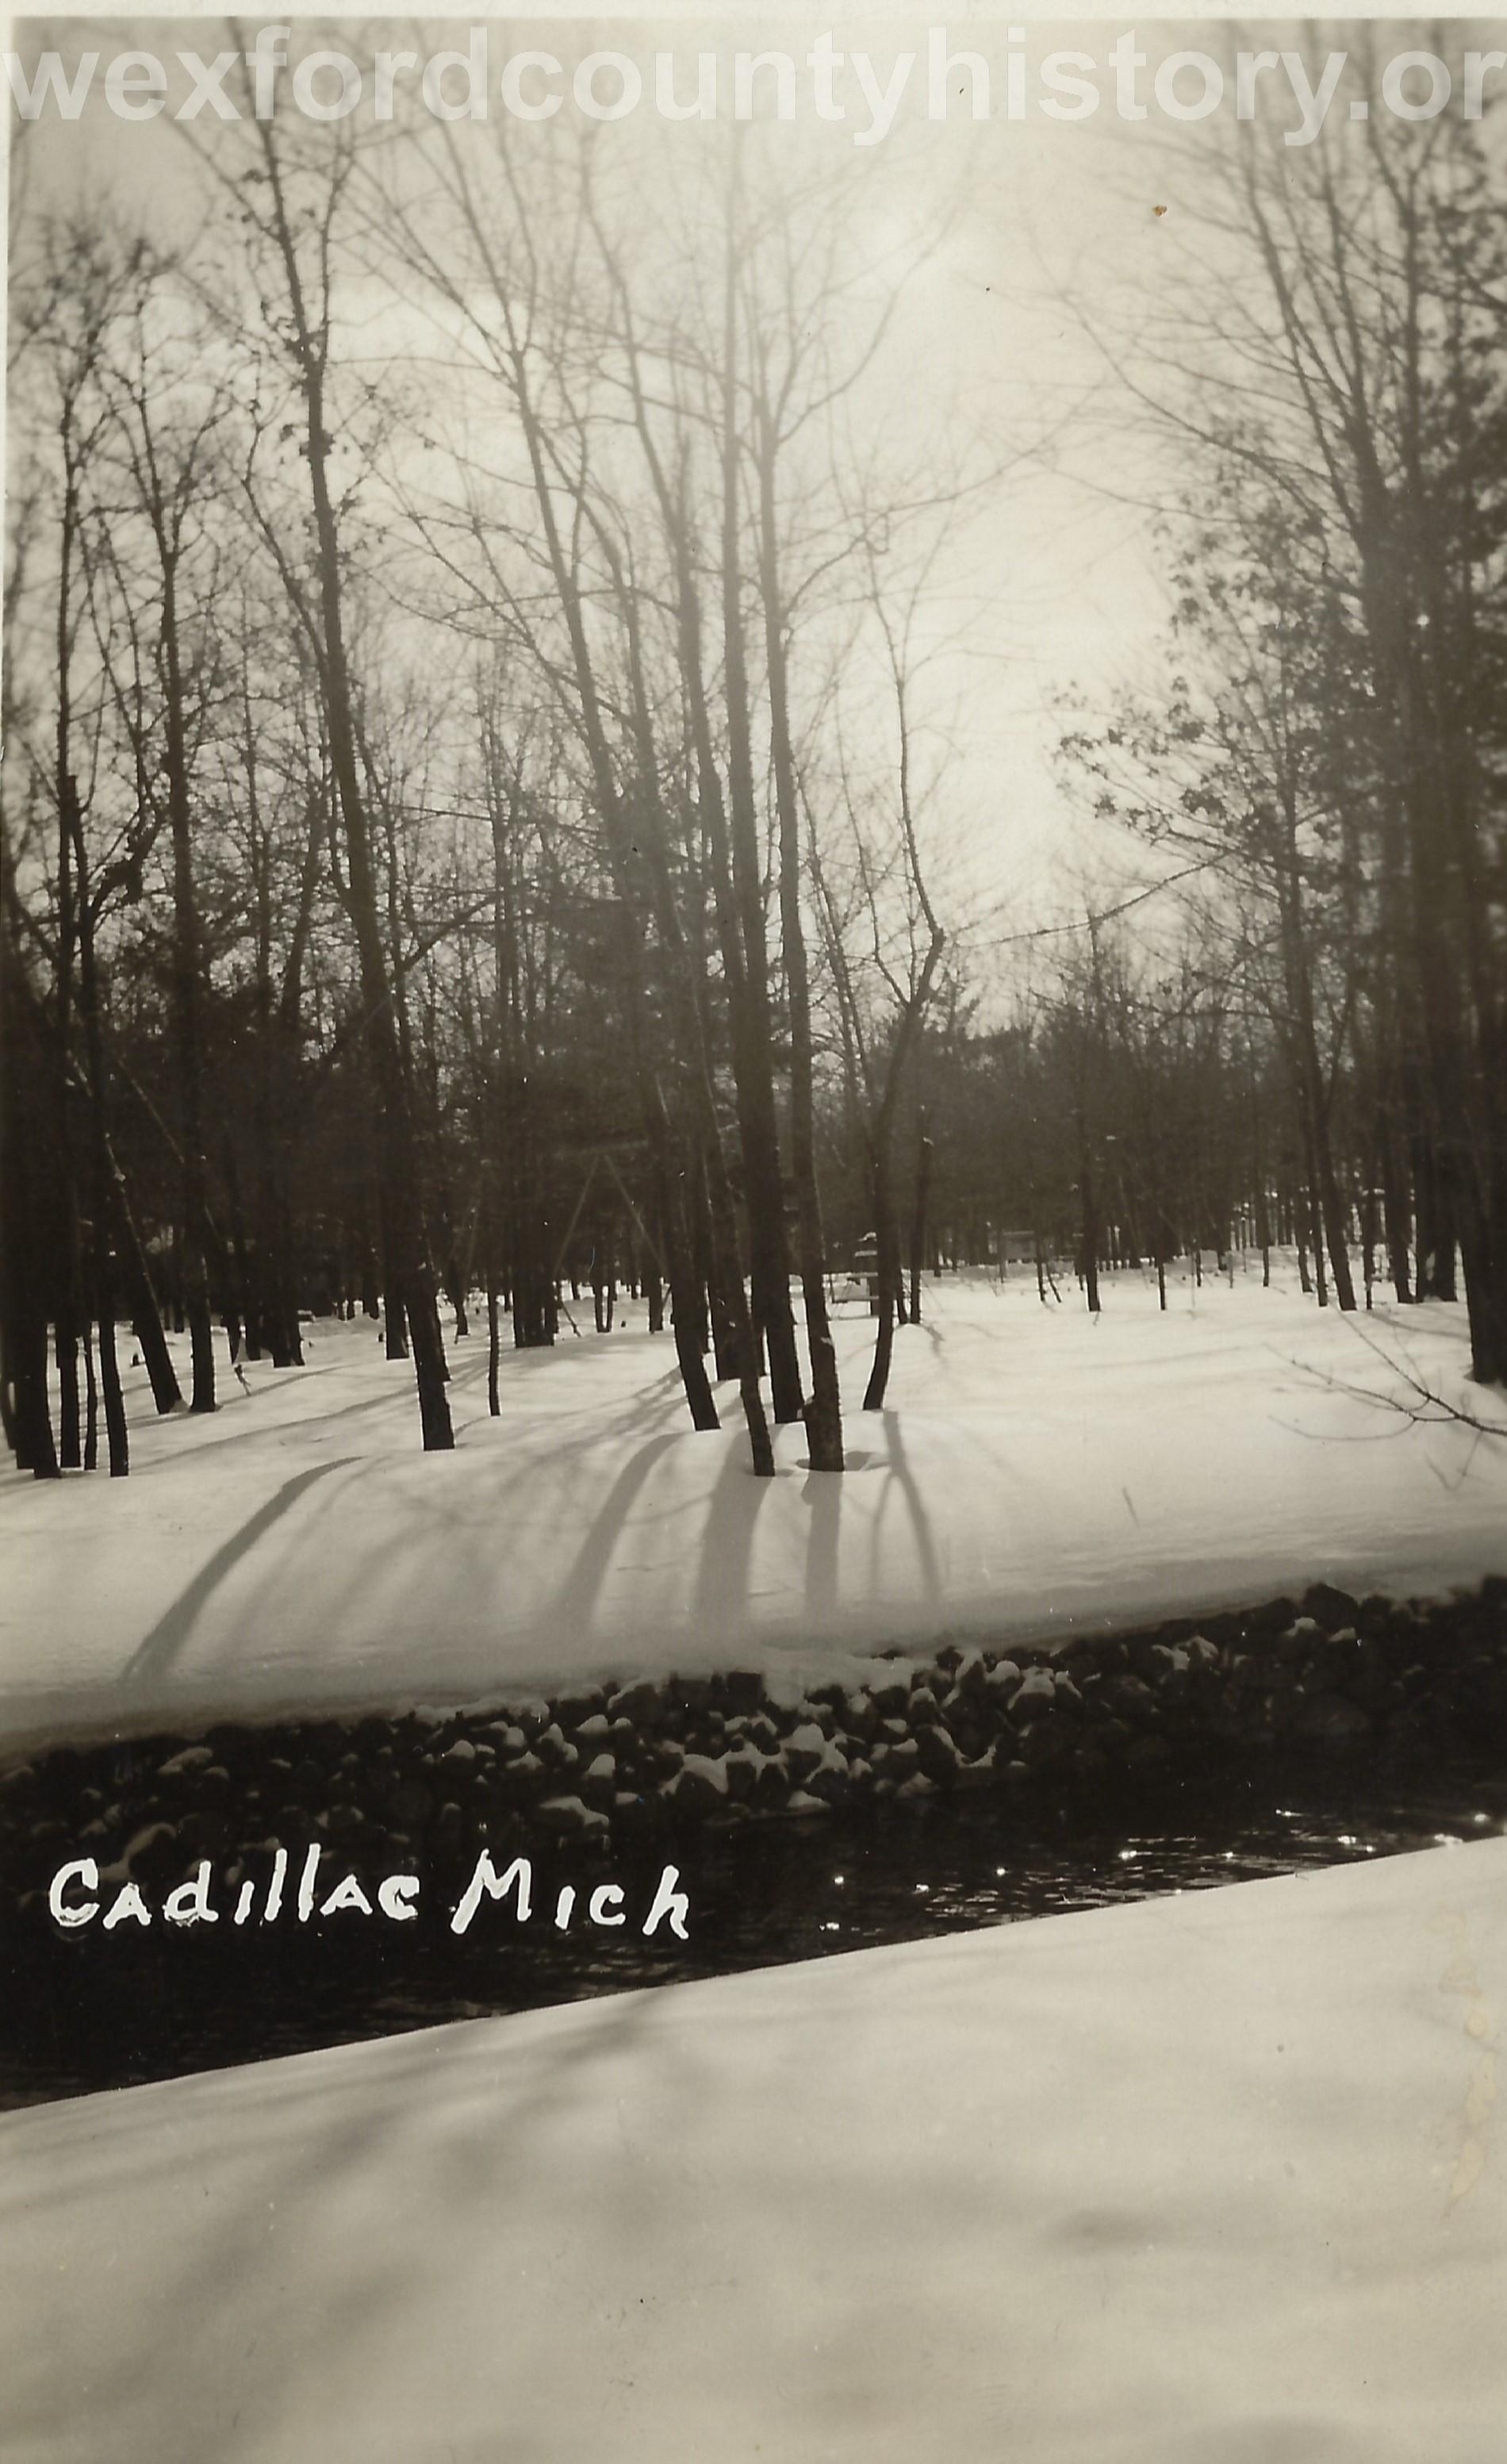 Cadillac-Random-Cadillac-Postcard-2